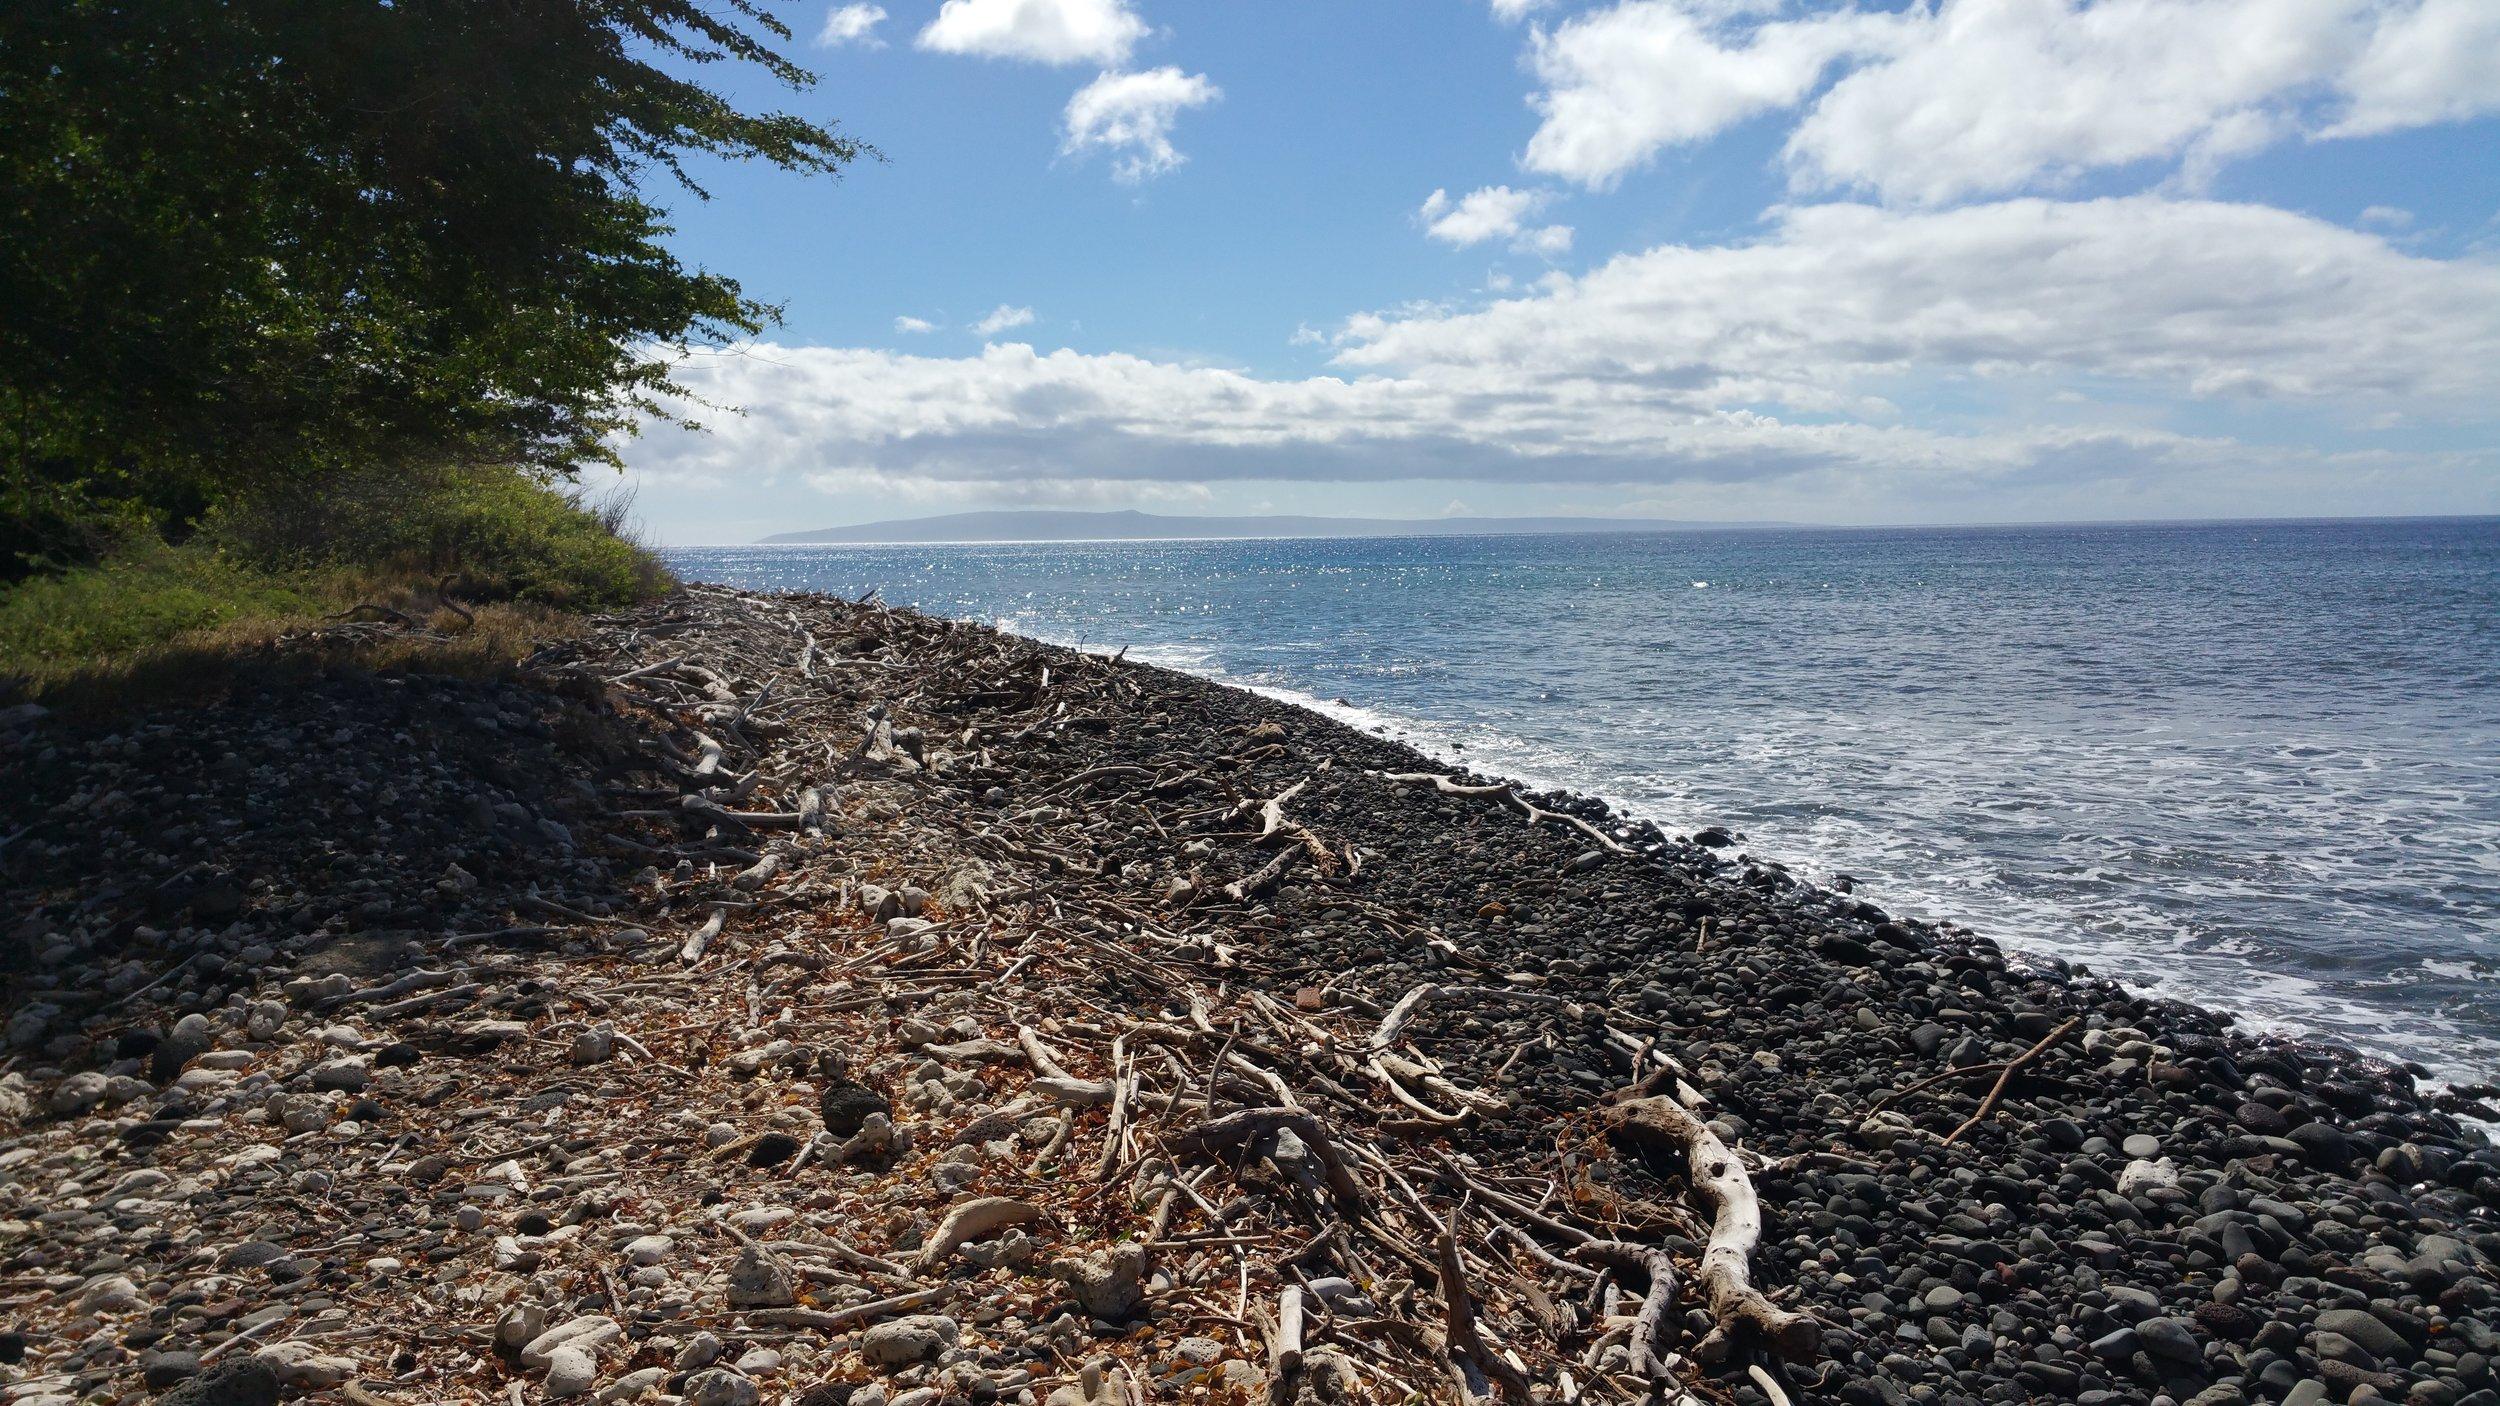 Olowalu, Maui - Pali to Puamana Project